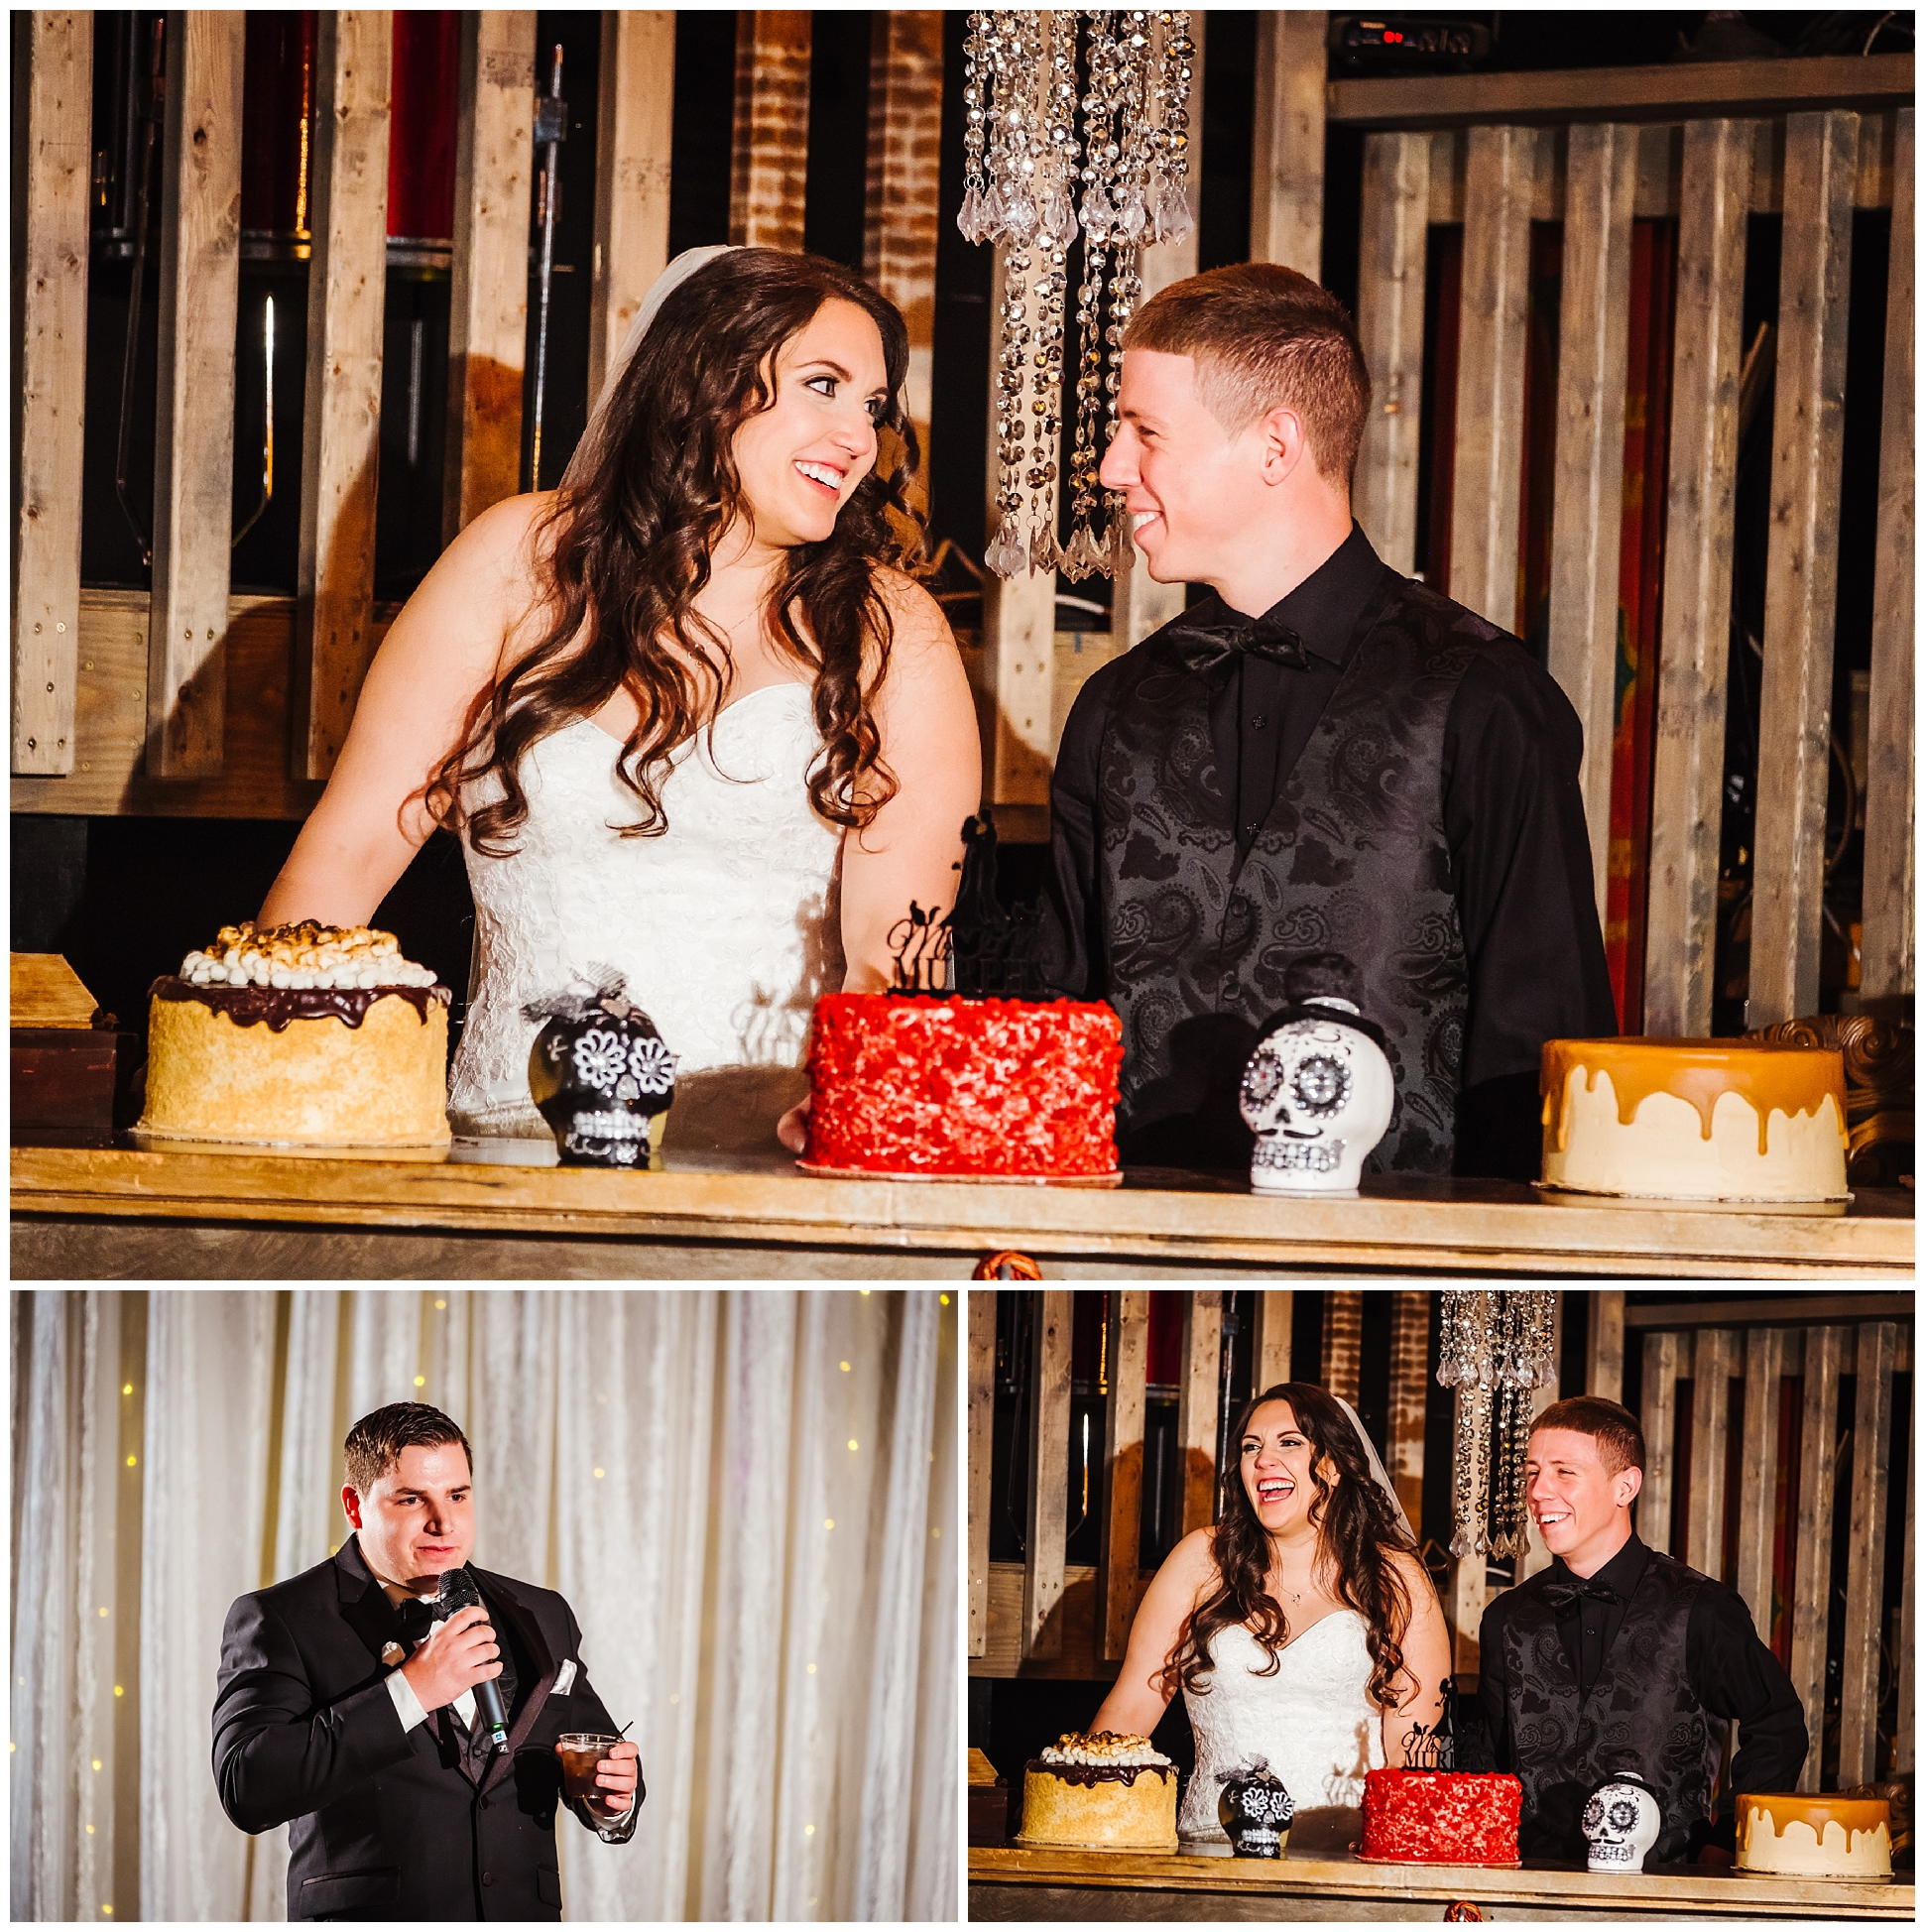 tampa-wedding-photographer-unique-indoor-venue_0045.jpg